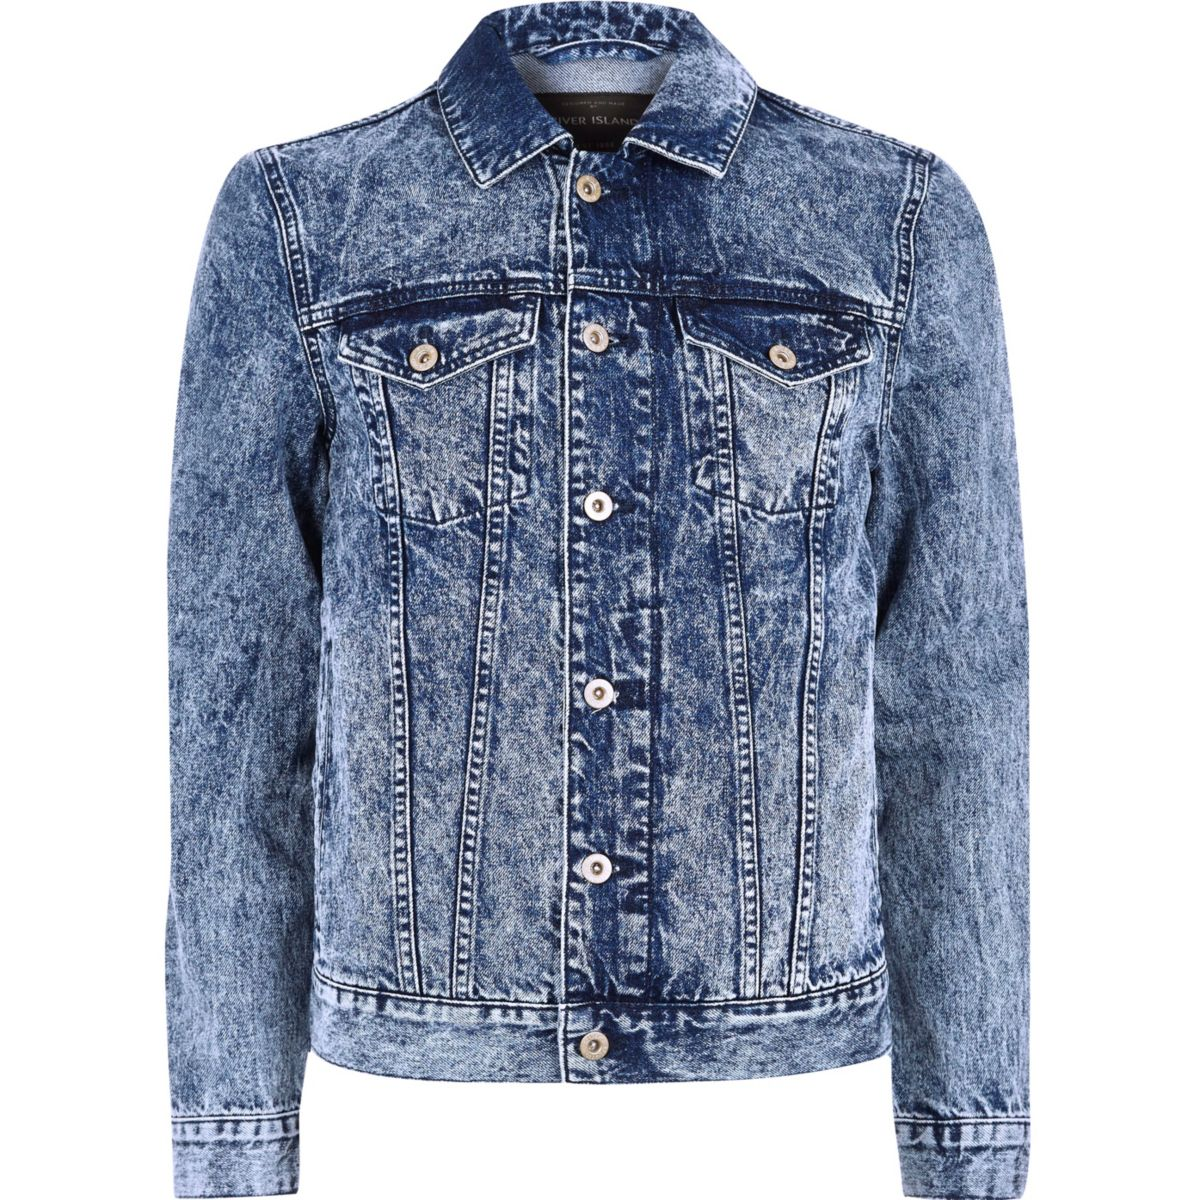 Blaue Jeansjacke in Acid-Waschung